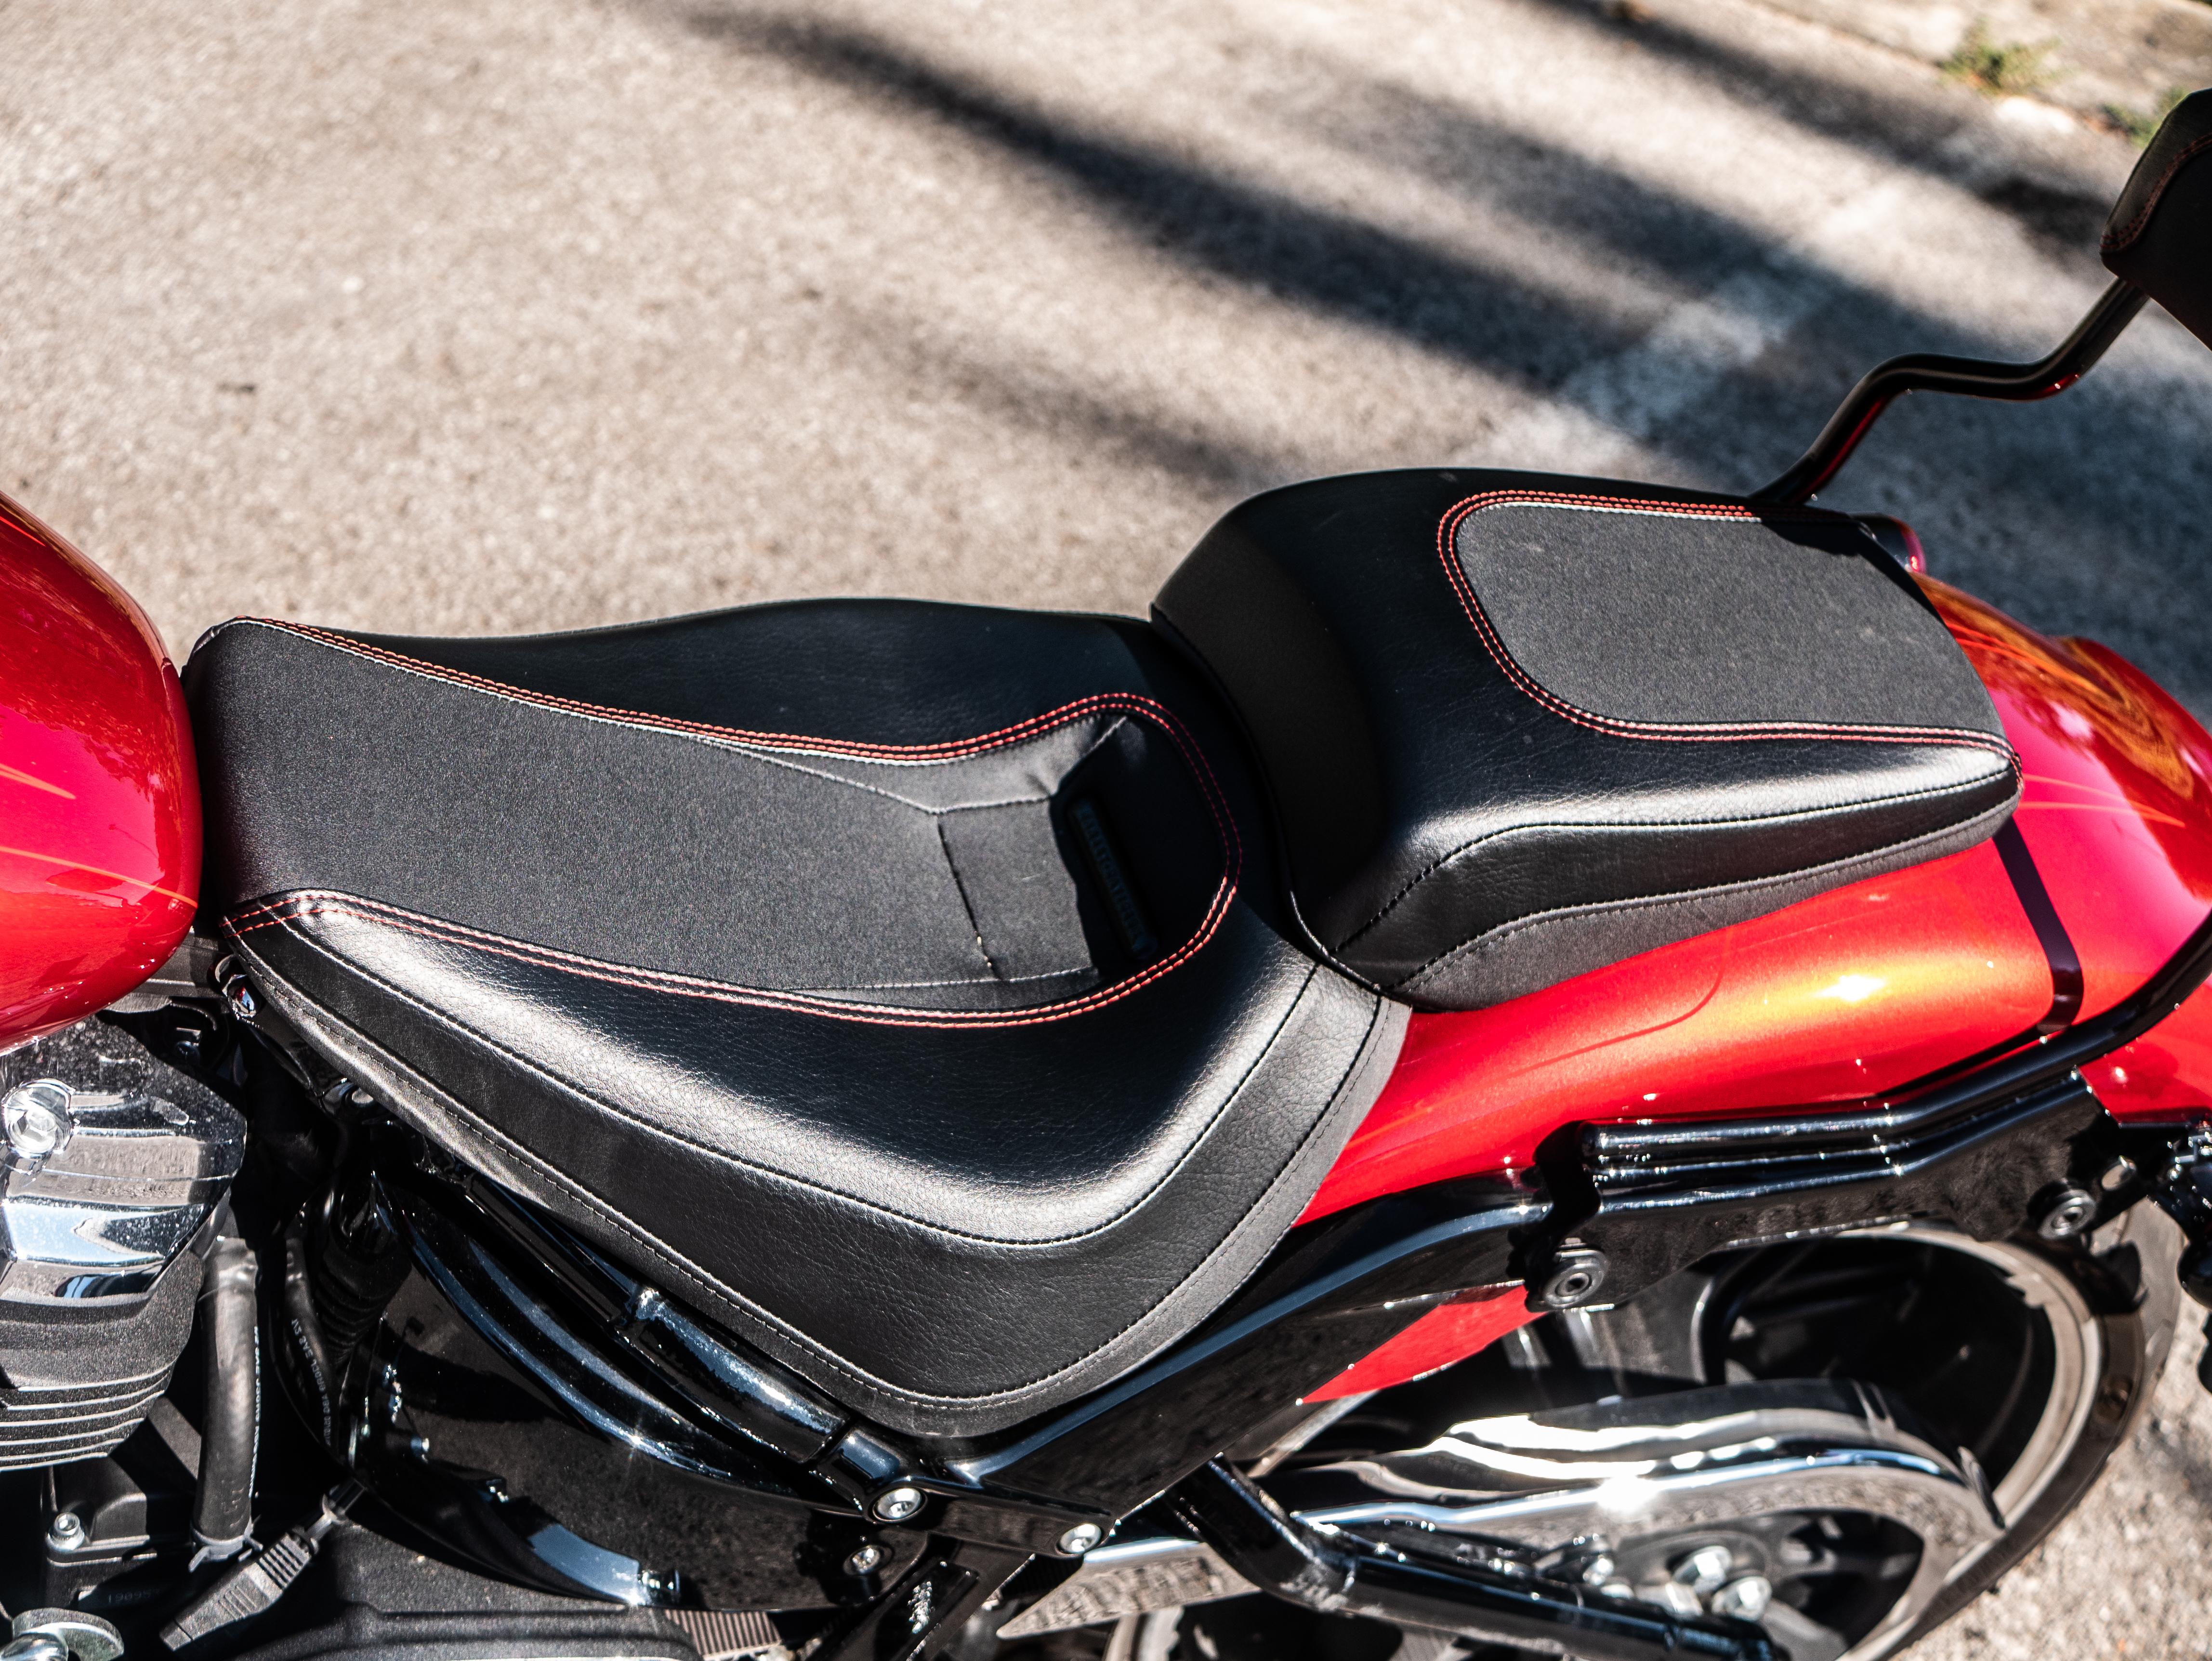 Pre-Owned 2019 Harley-Davidson Breakout 114